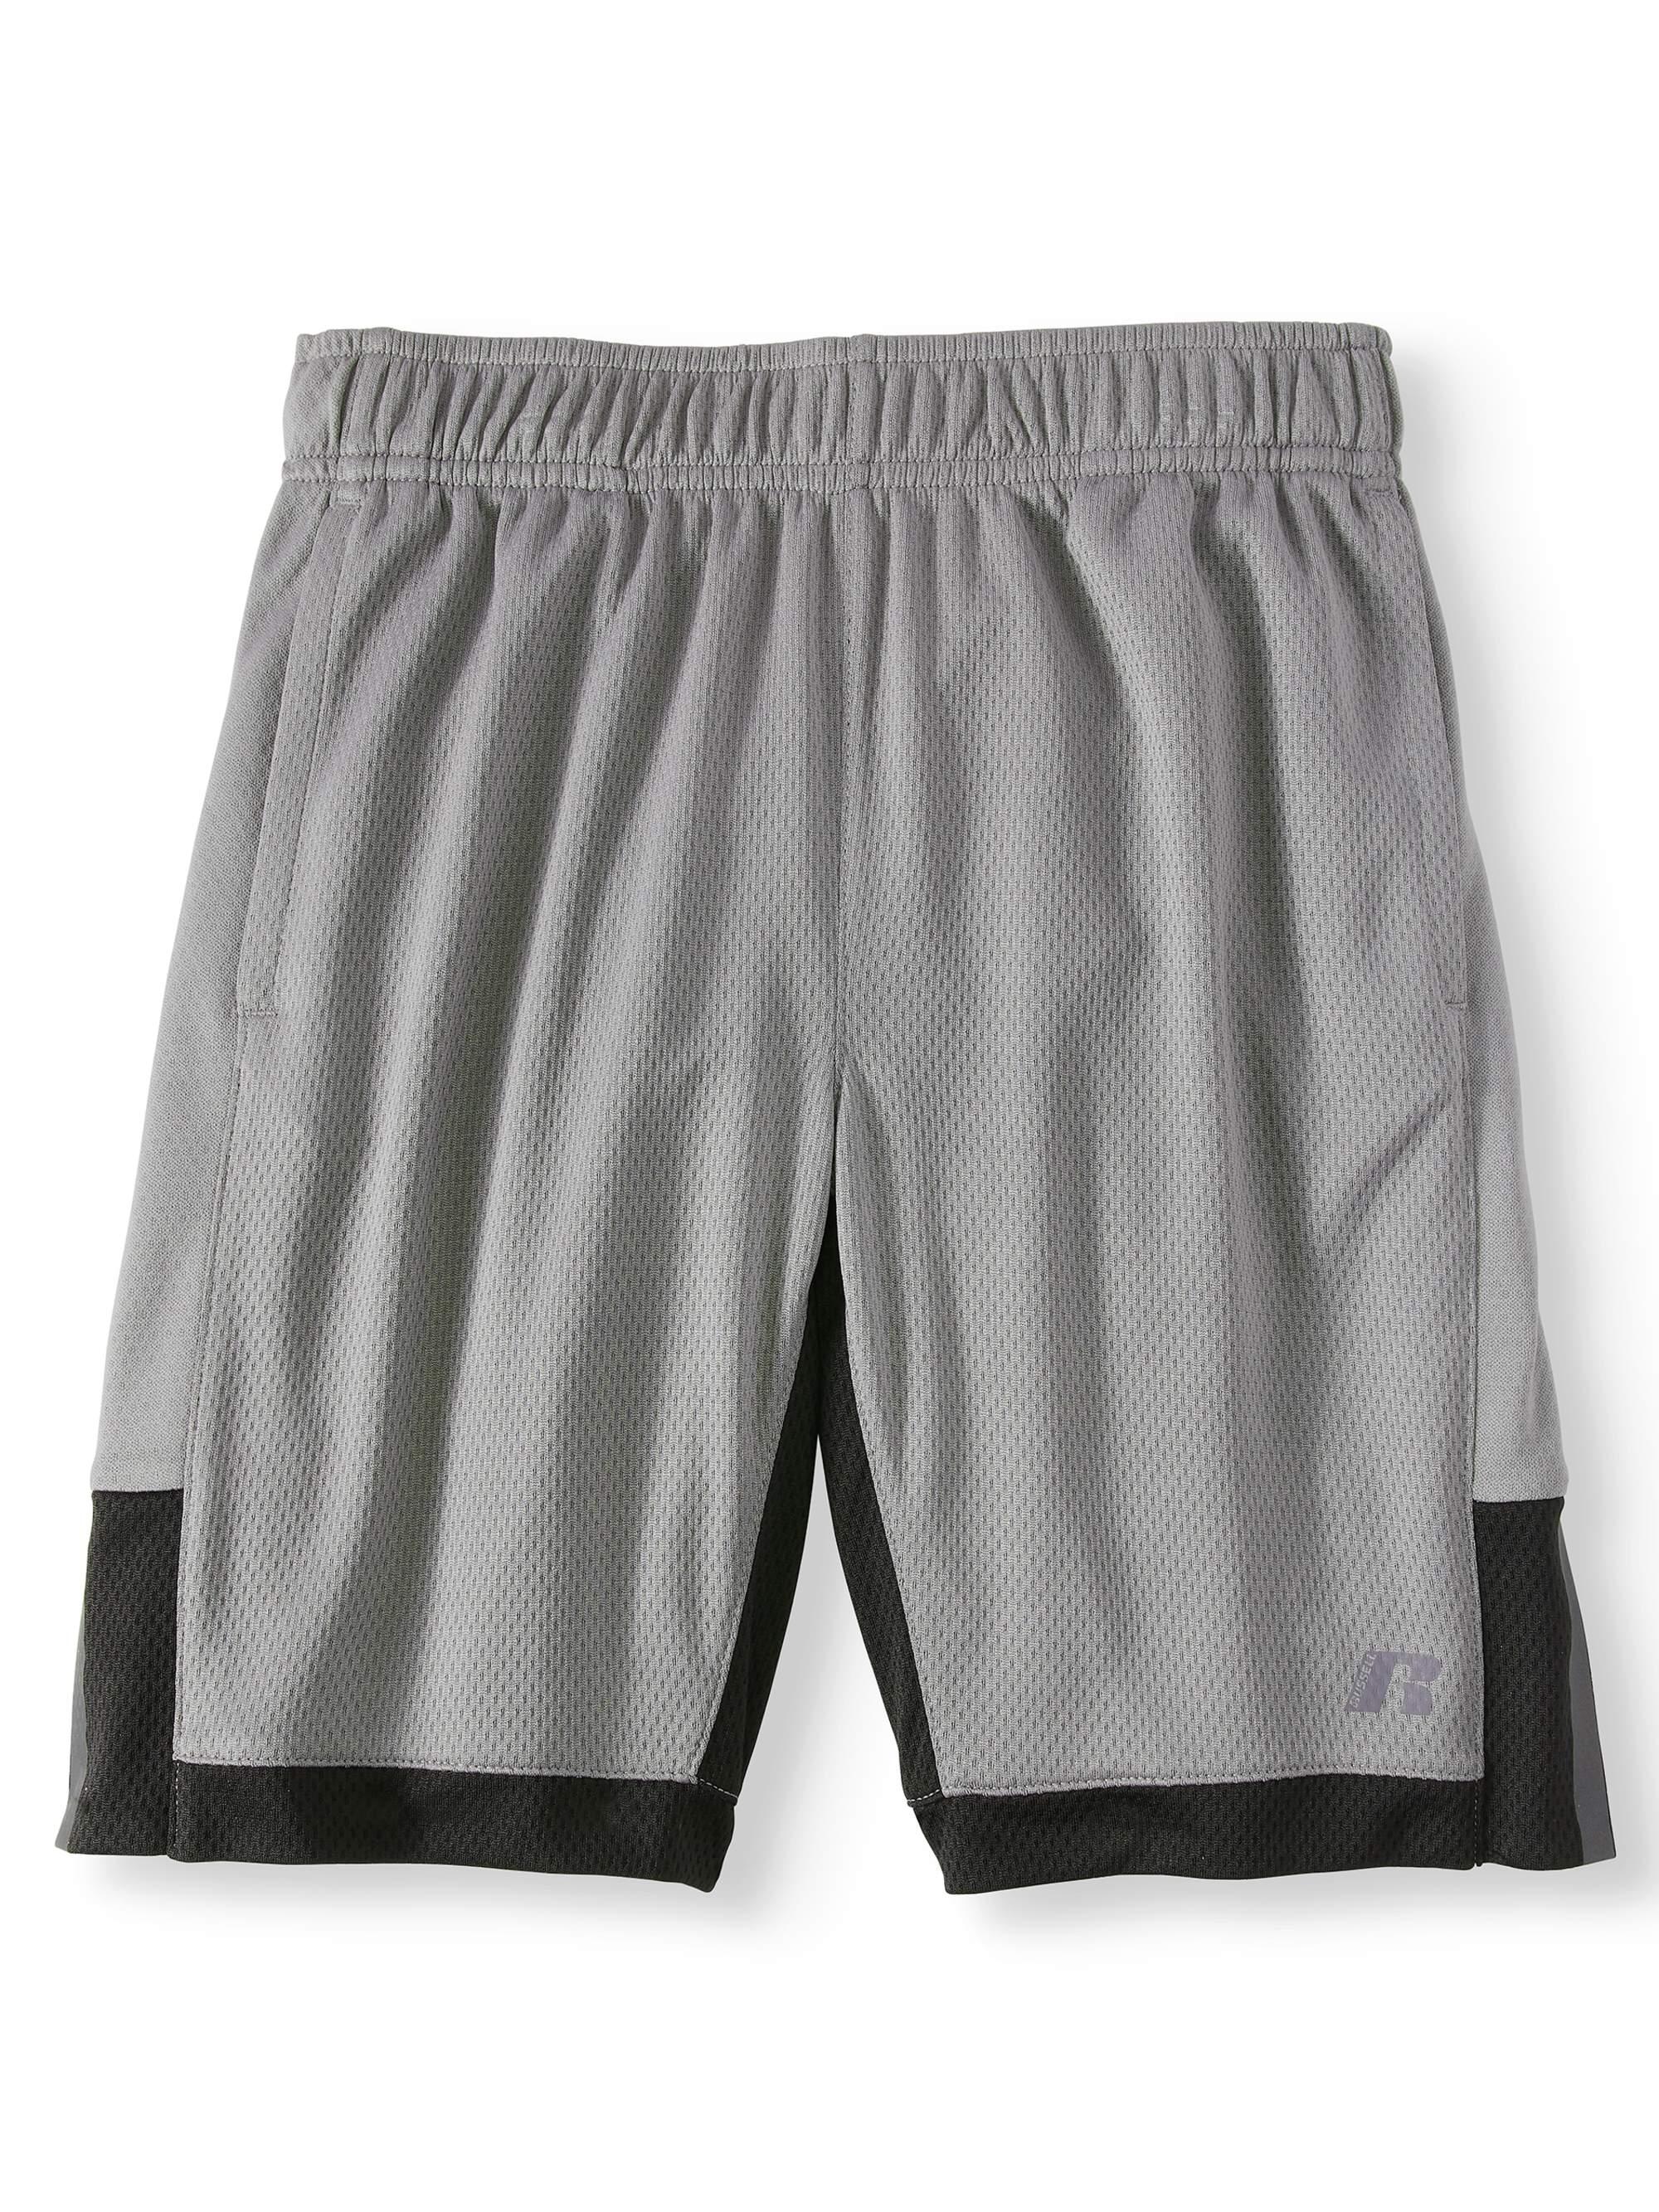 Training Shorts (Little Boys & Big Boys)